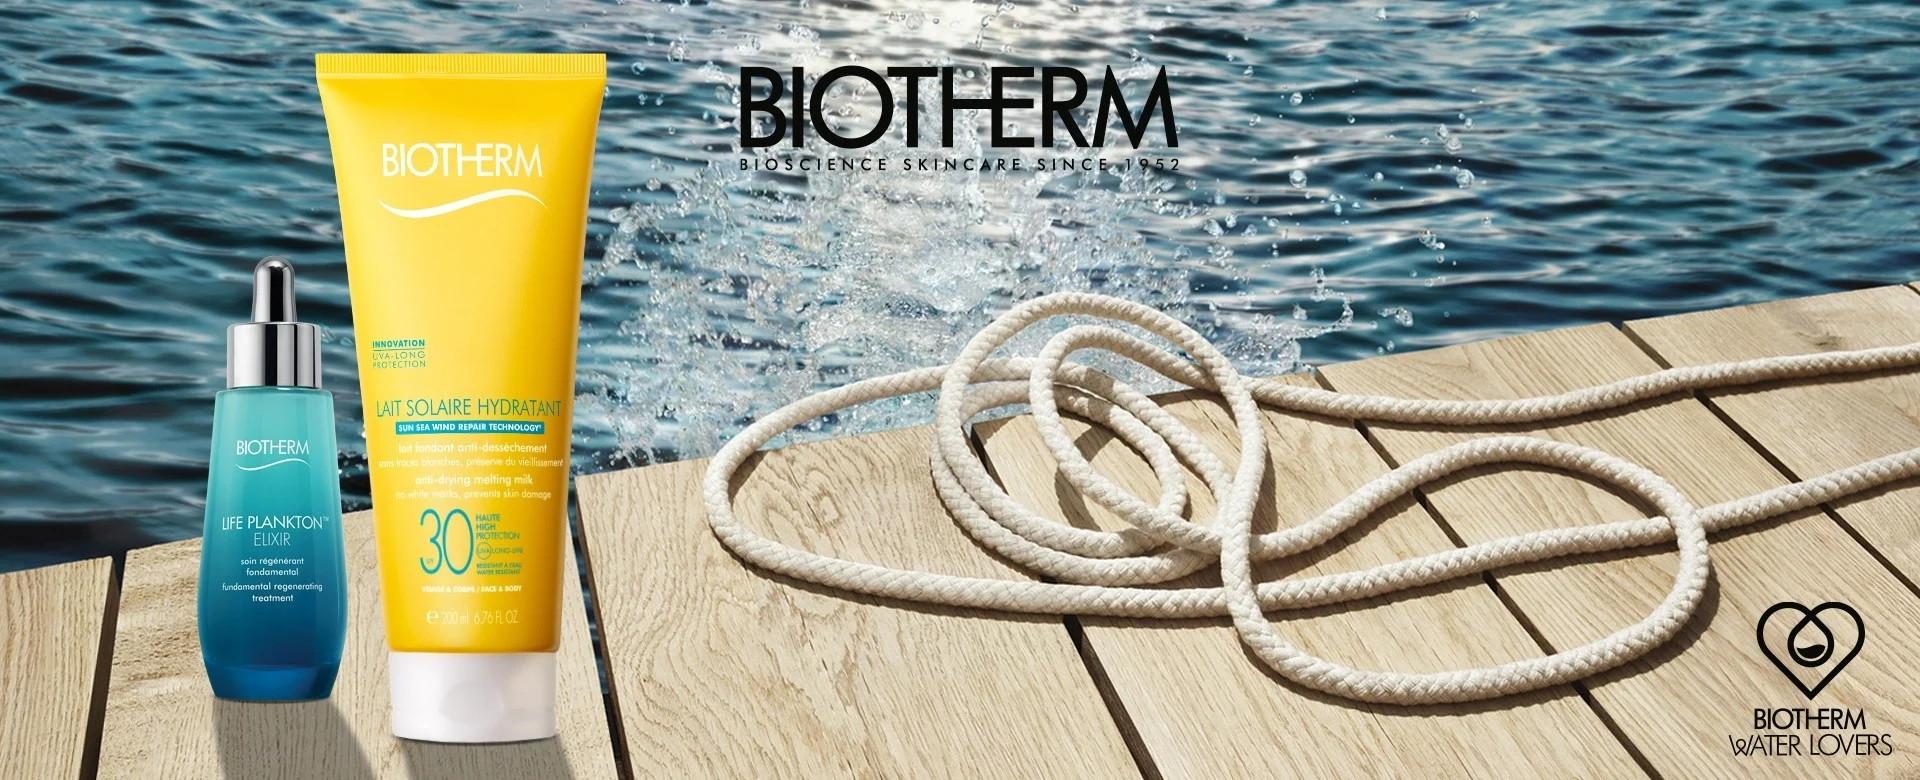 Biotherm per Comar Profumerie